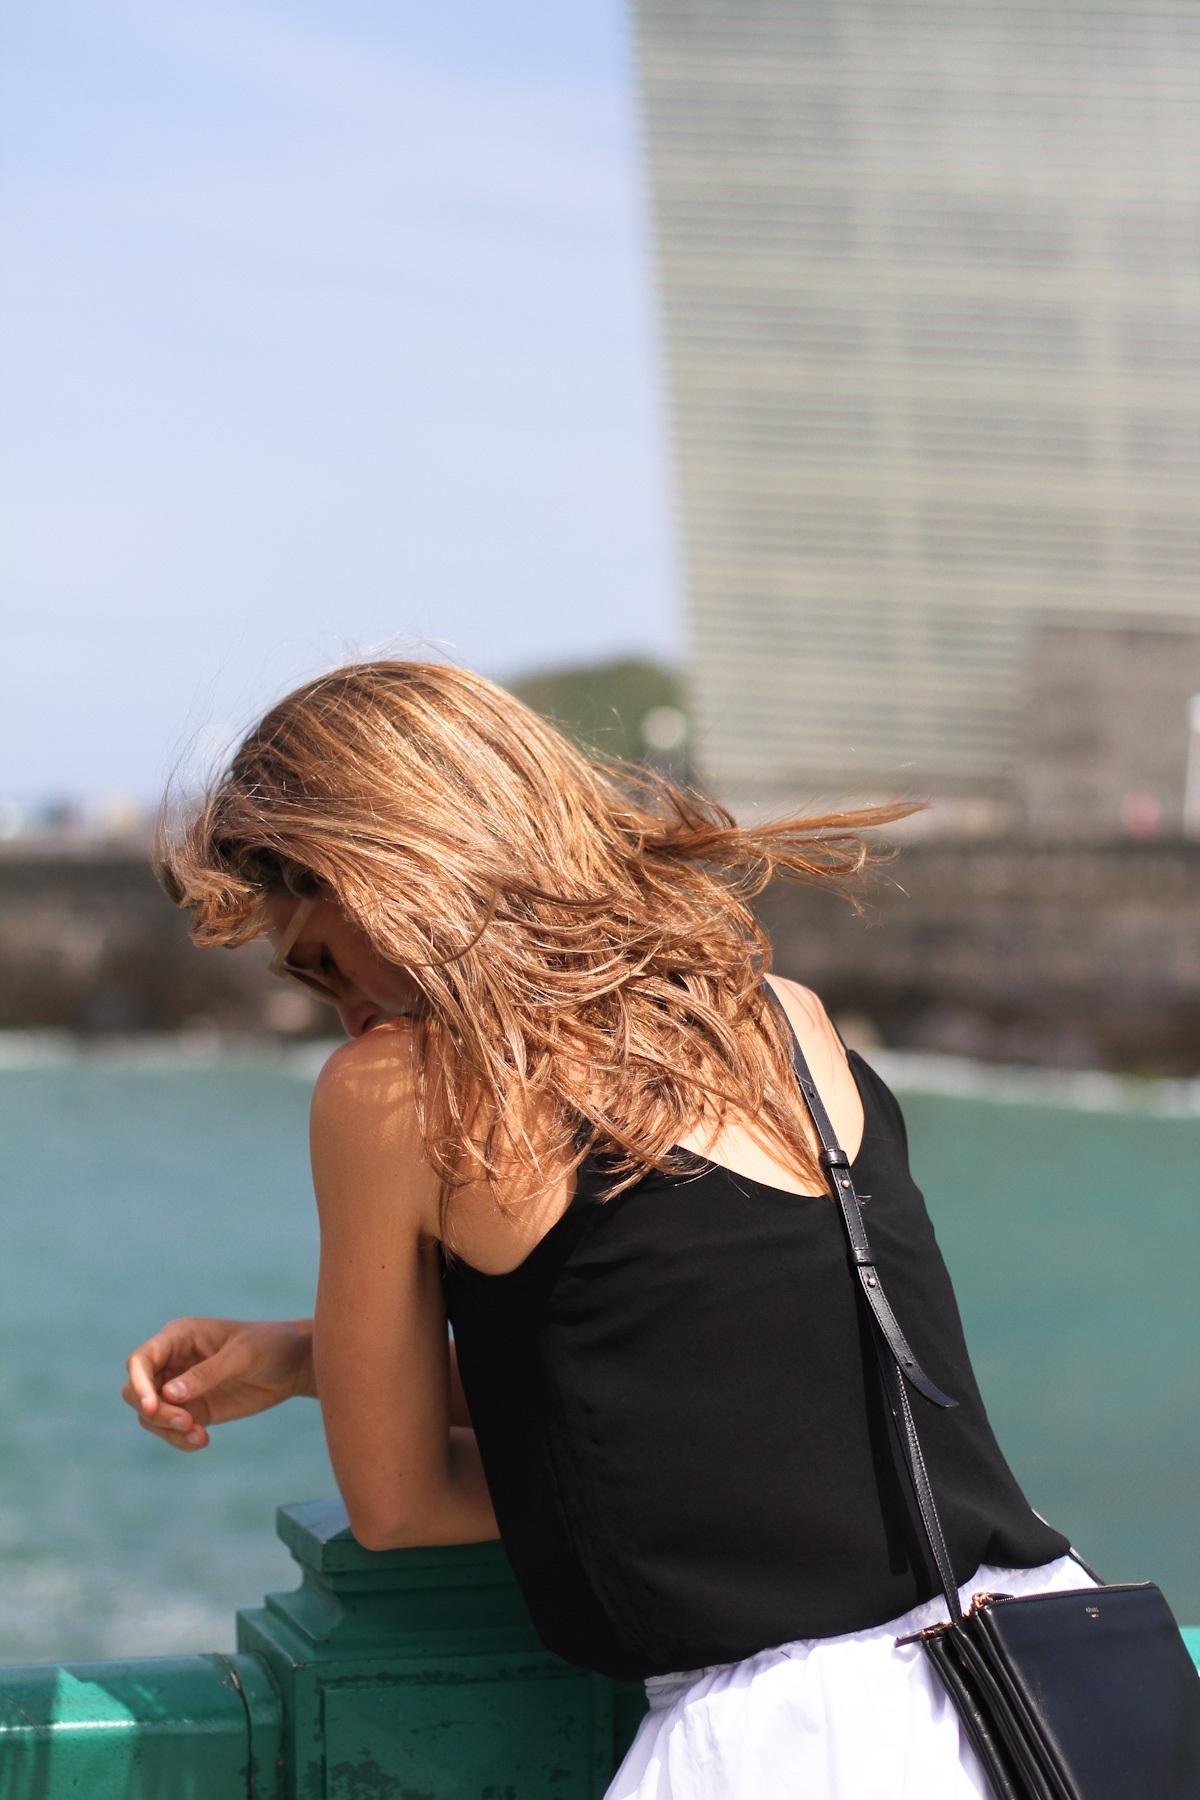 clochet_outfit_streetstyle_zara-white-midi-skirt_celine-trio-bag_-4